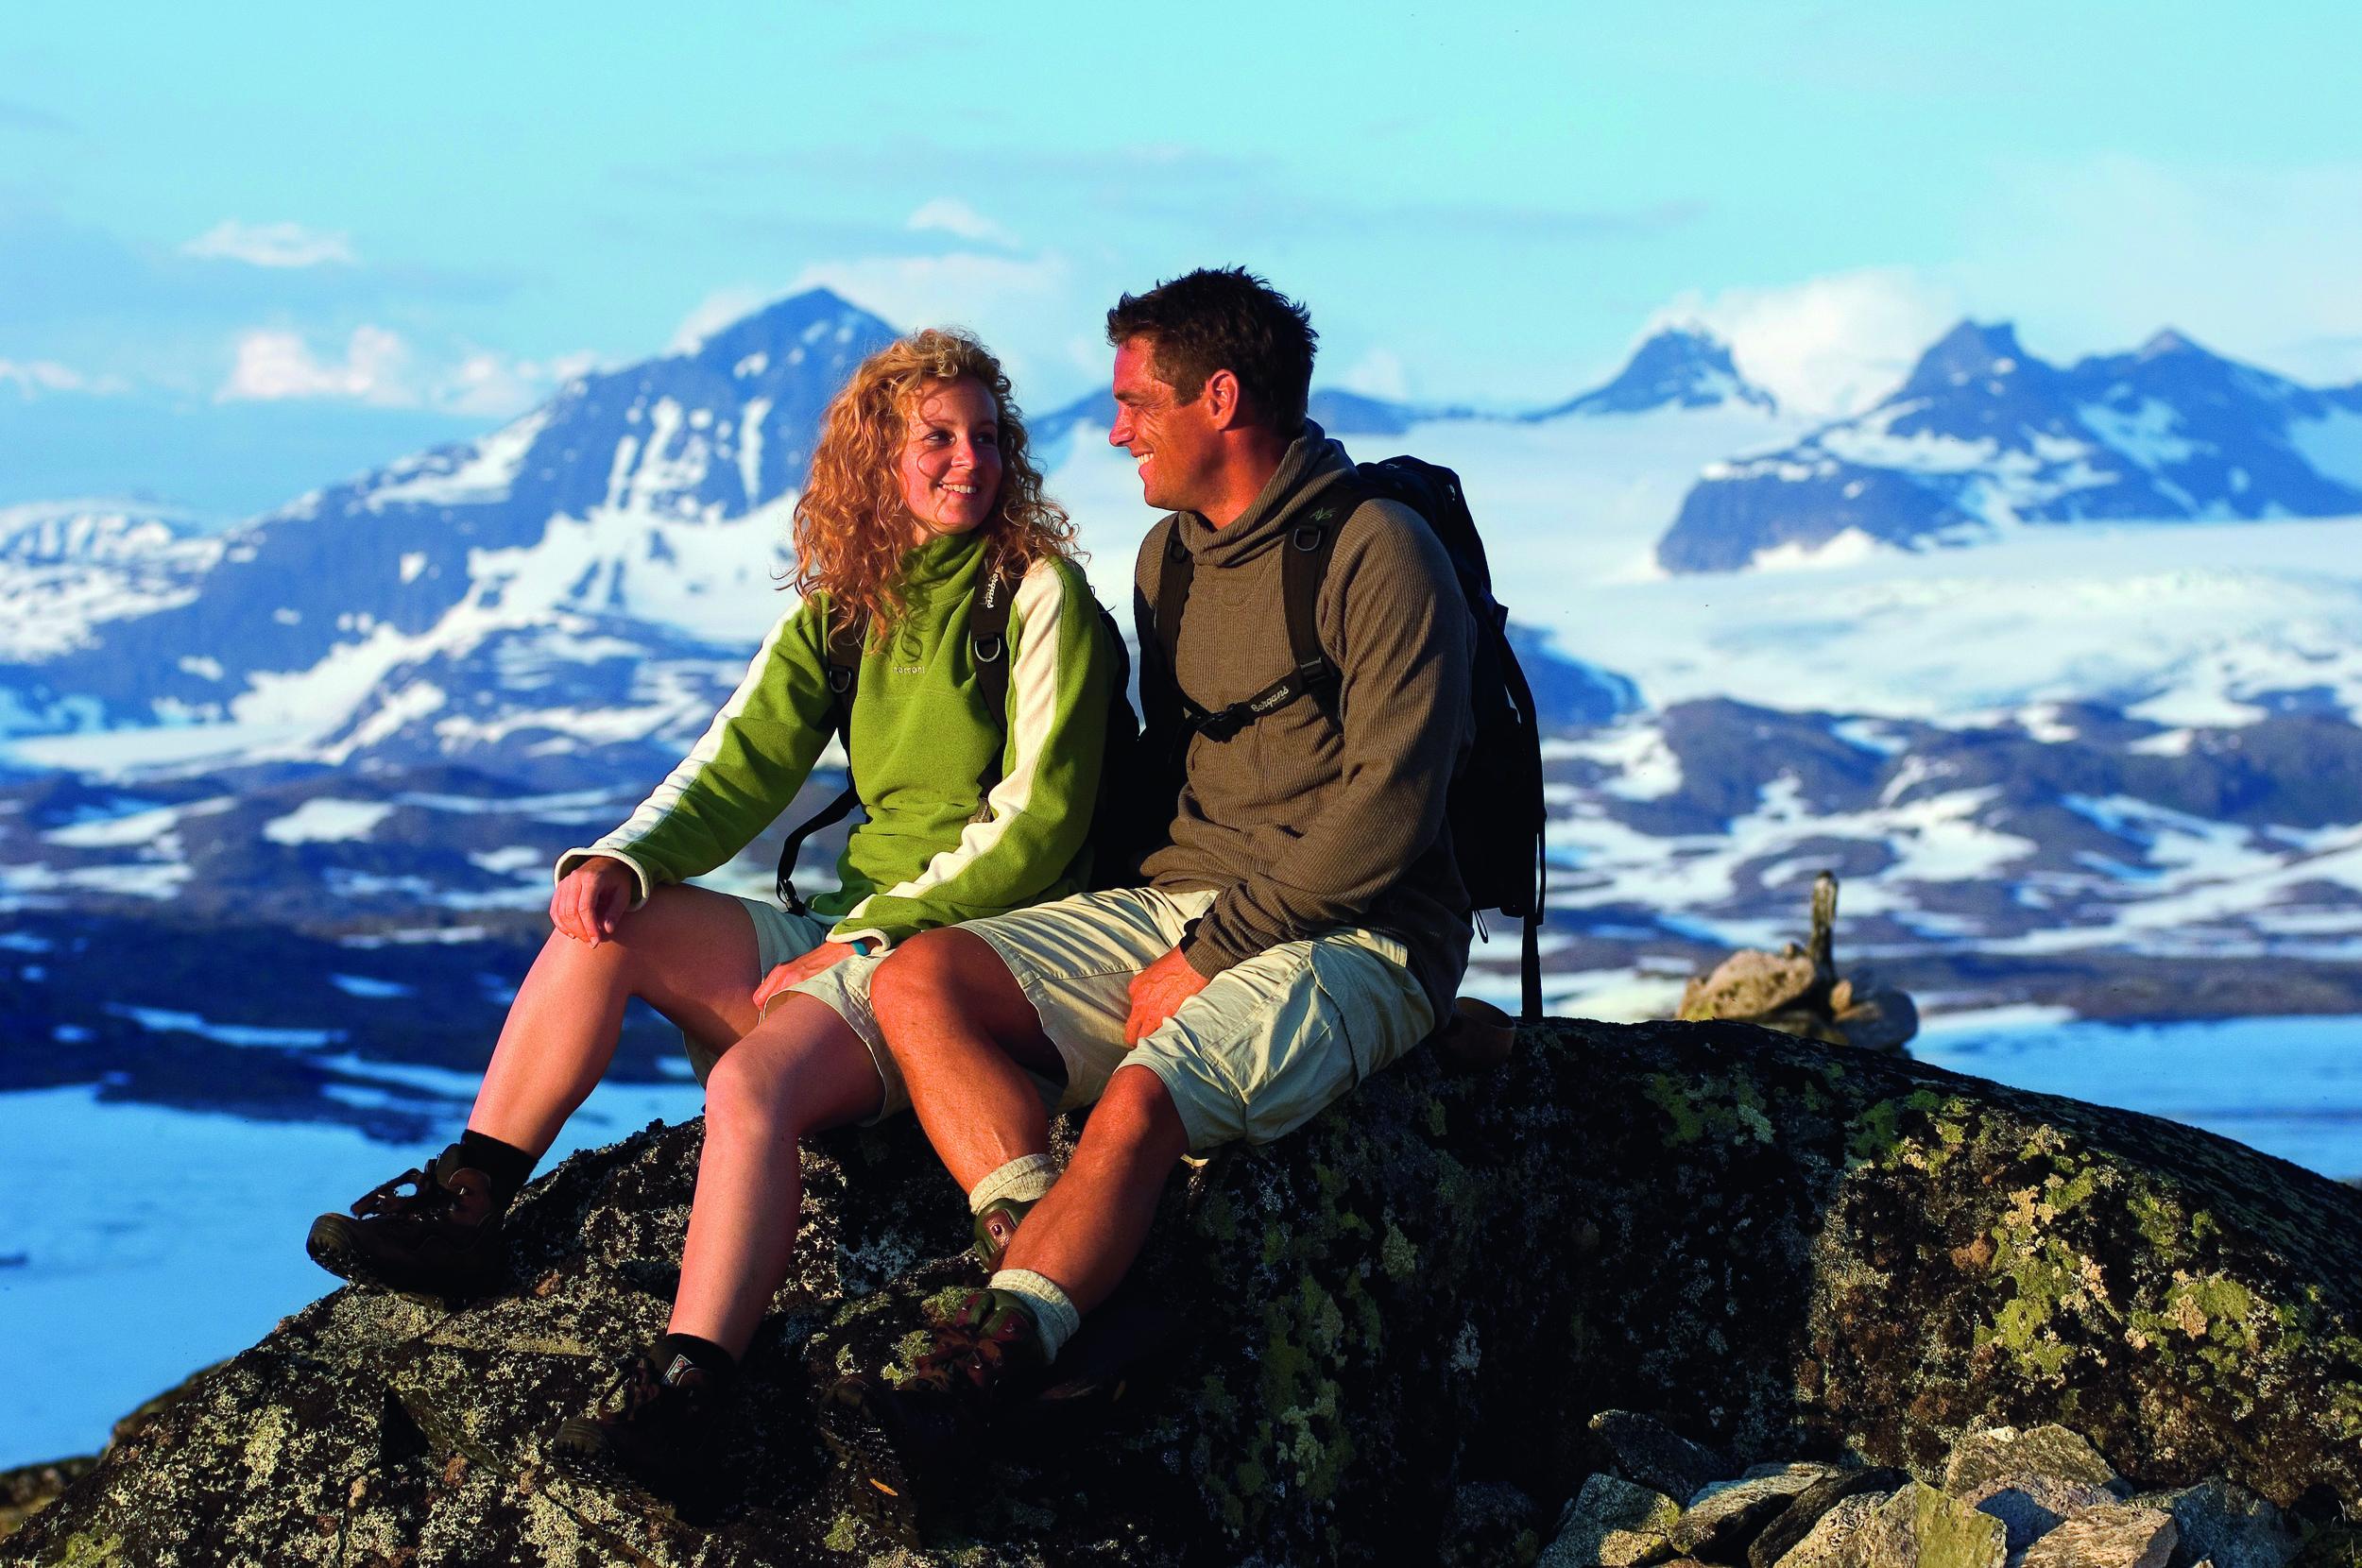 Jotunheimen-couple-enjoying-the-view-fn668chm-1024.jpg